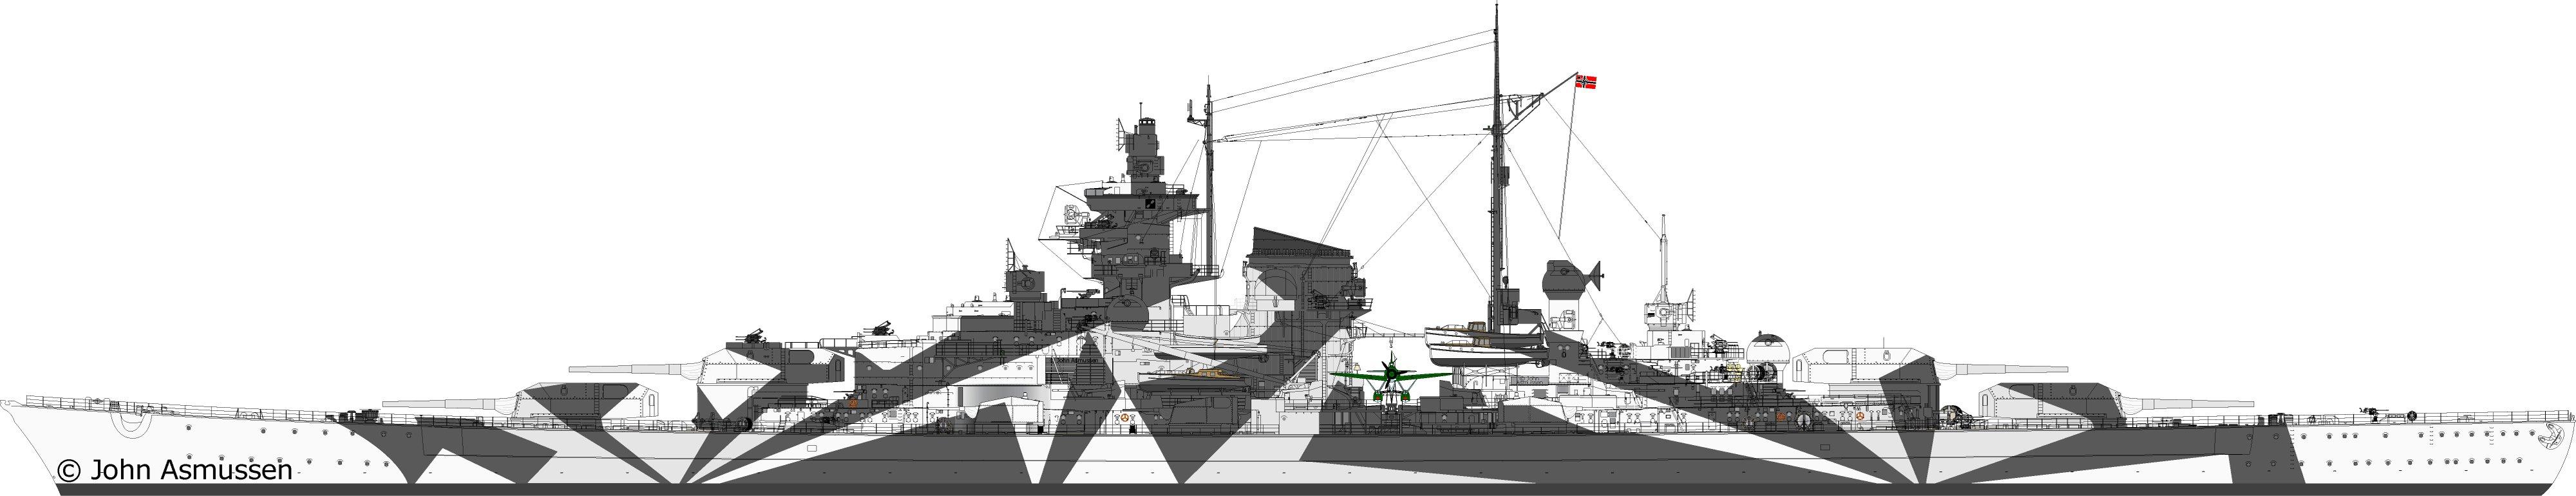 Tirpitz 1:350 Platinum Edition 18101912181323134915950528